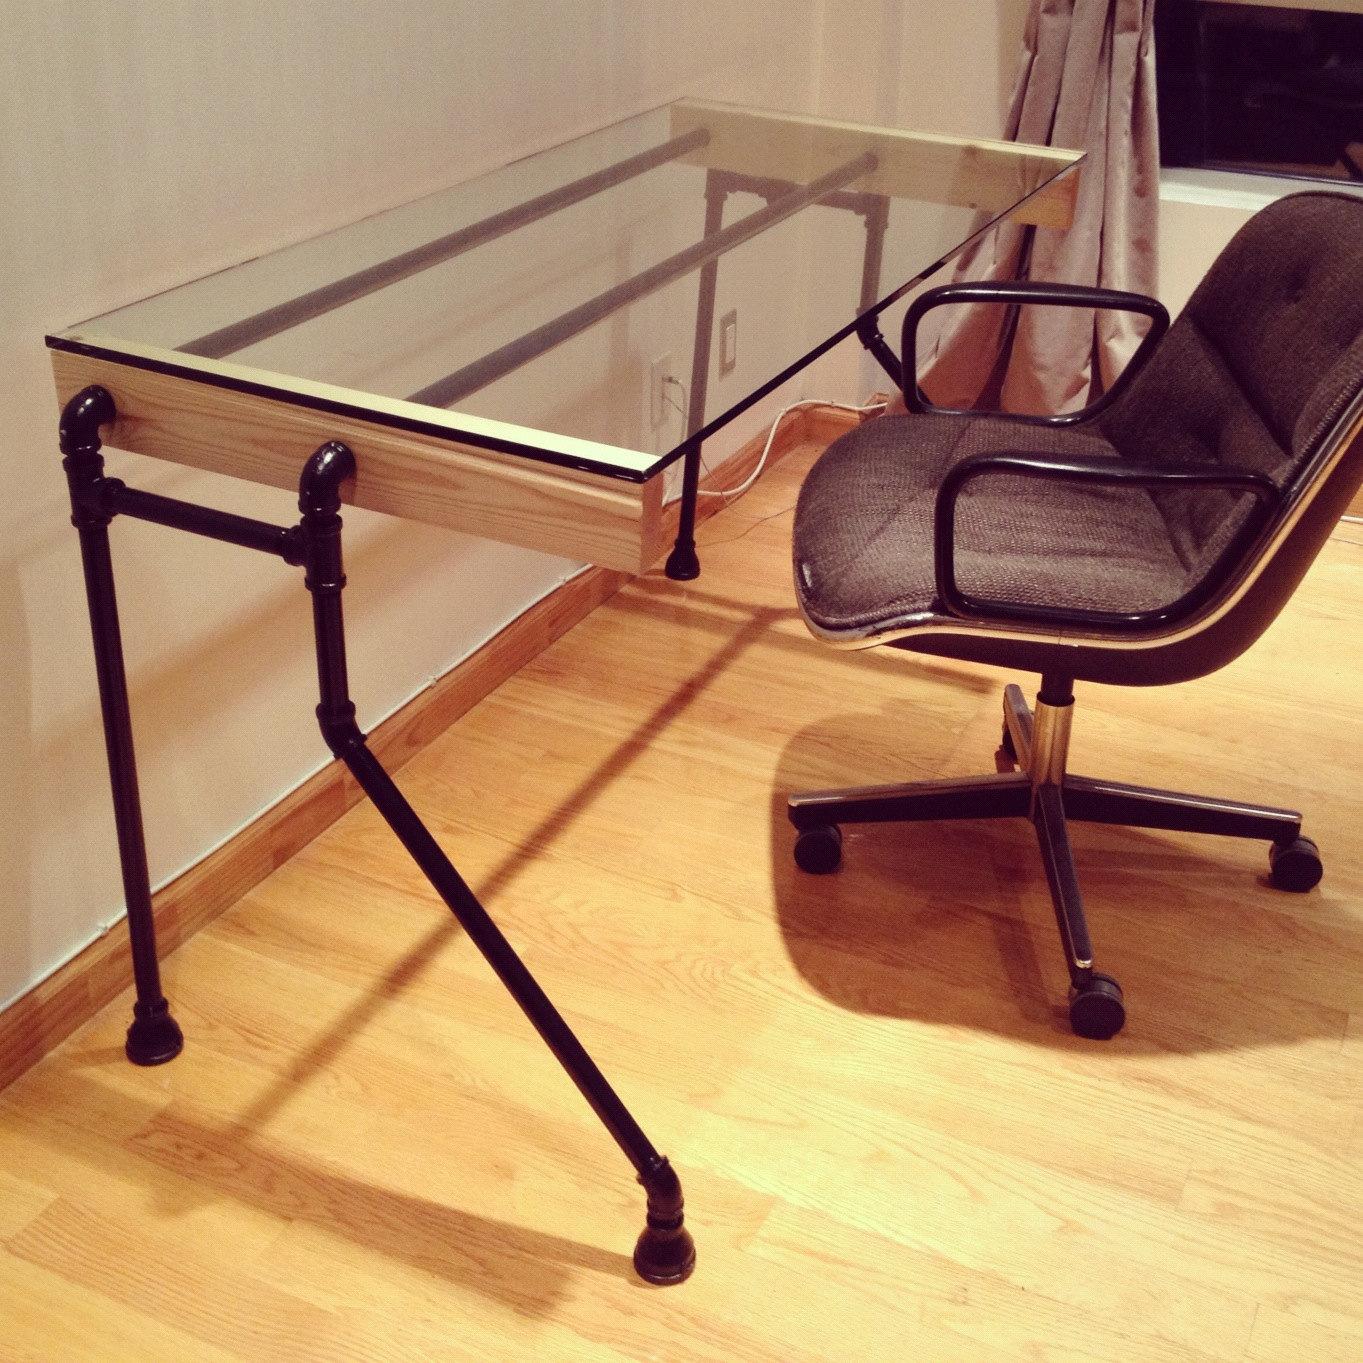 il 570xN.388958685 bti7 Журнальные столы от студии cushdesignstudio. svoimi rukami %d0%bc%d0%b5%d0%b1%d0%b5%d0%bb%d1%8c